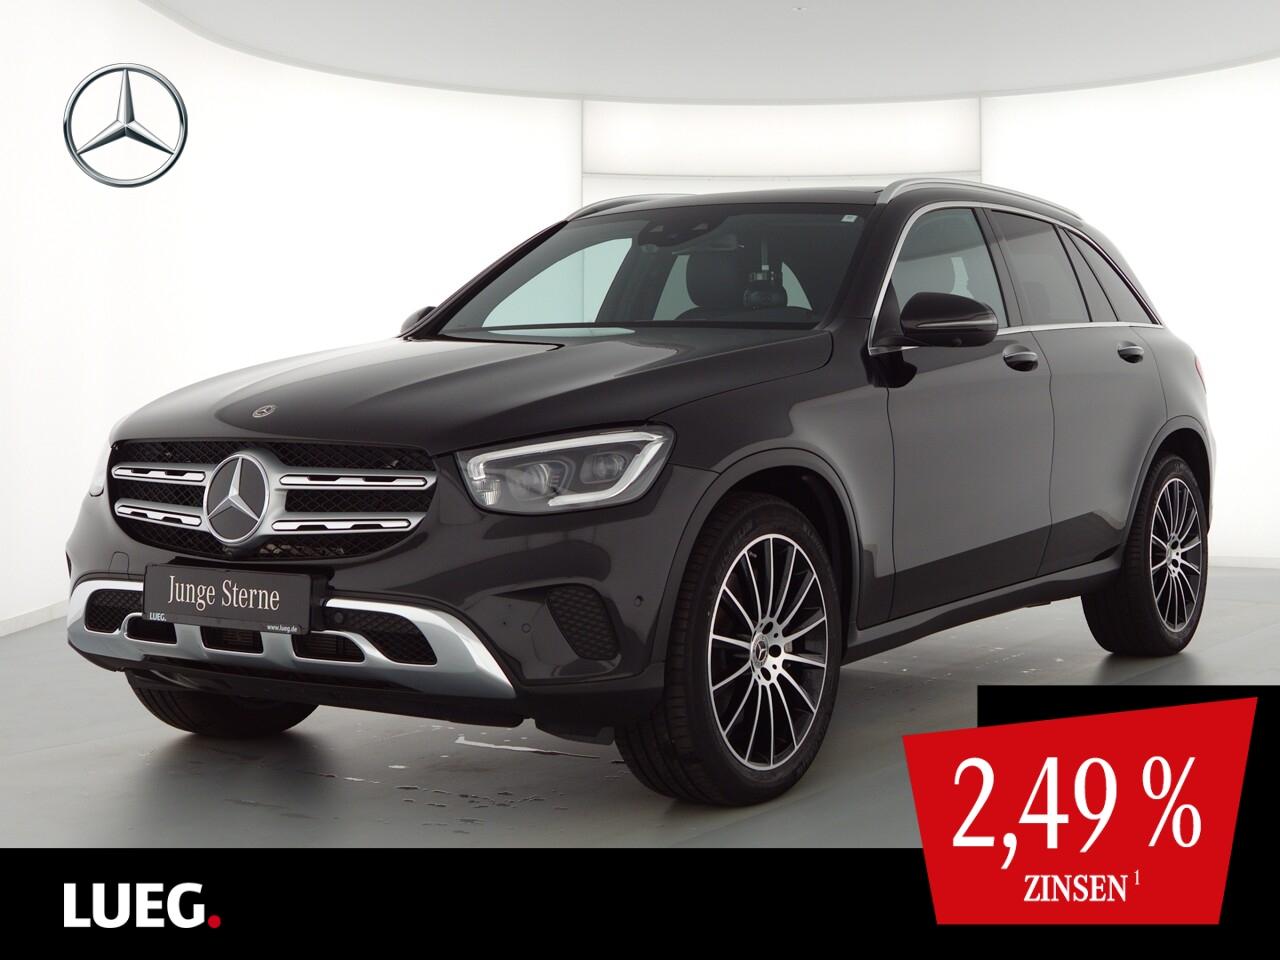 Mercedes-Benz GLC 300 4M MBUX+Pano+Burm+Mbeam+20+Sthzg+AHK+360, Jahr 2020, Benzin